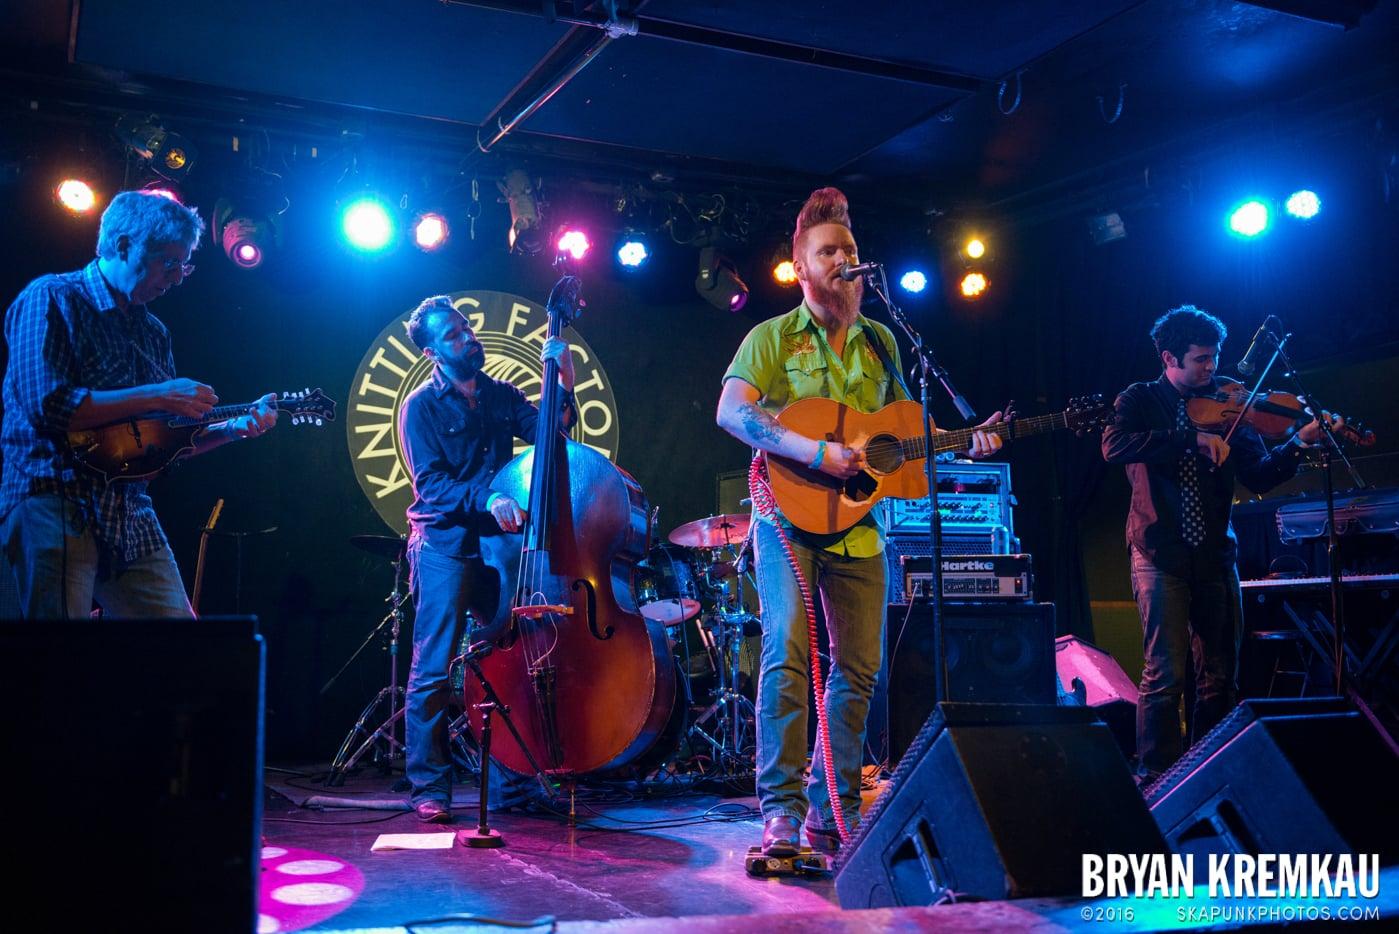 Danny Burns Band @ Knitting Factory, Brooklyn, NY - 9.10.14 (4)